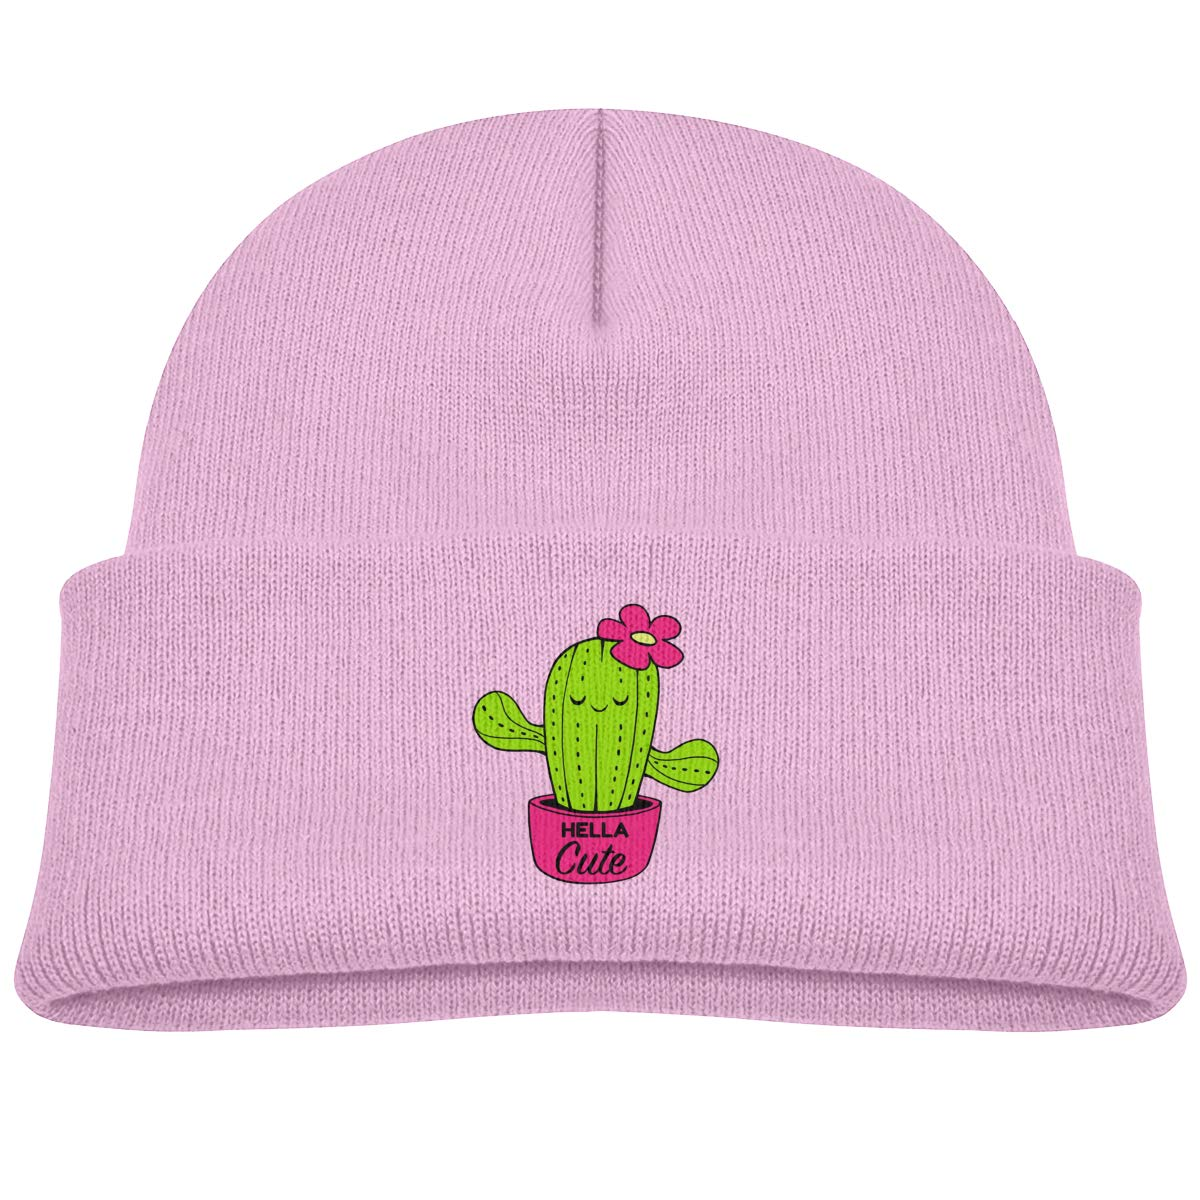 ACFUNEJRQ Cute Cactus Childrens Autumn and Winter Warm Soft Cap Woolen Knitted Hat